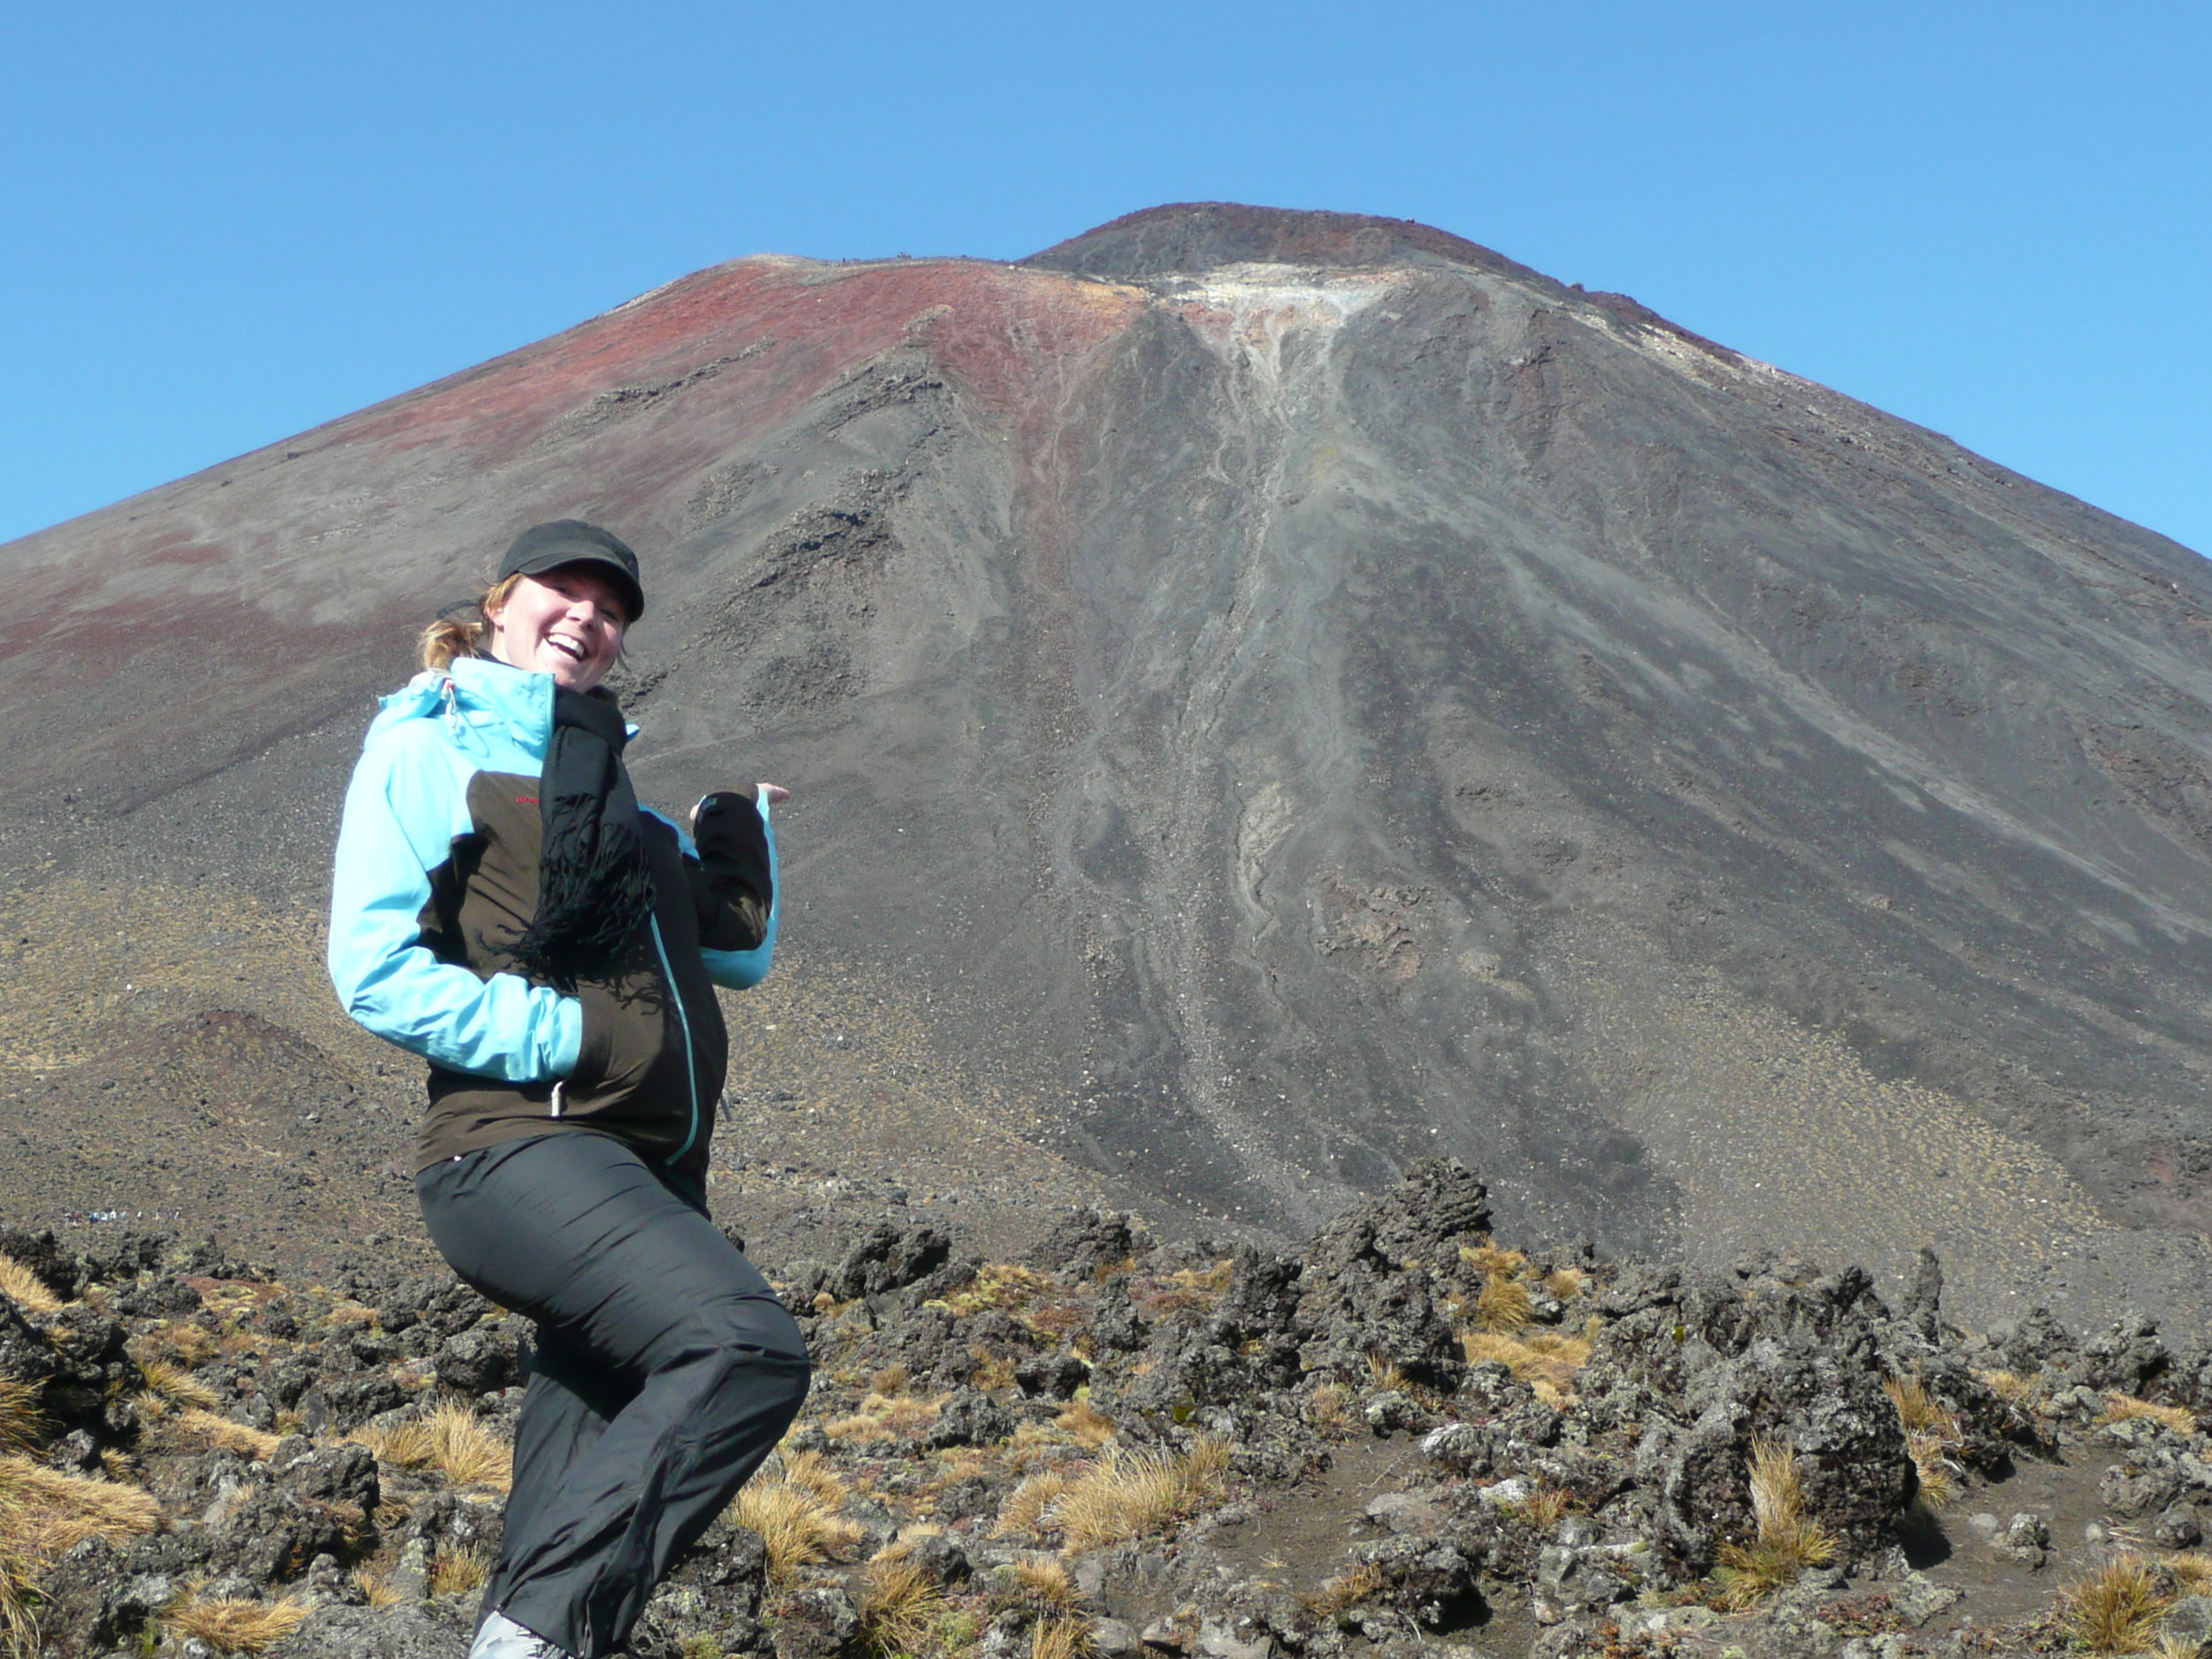 Hiking Tongariro crossing in 2010…